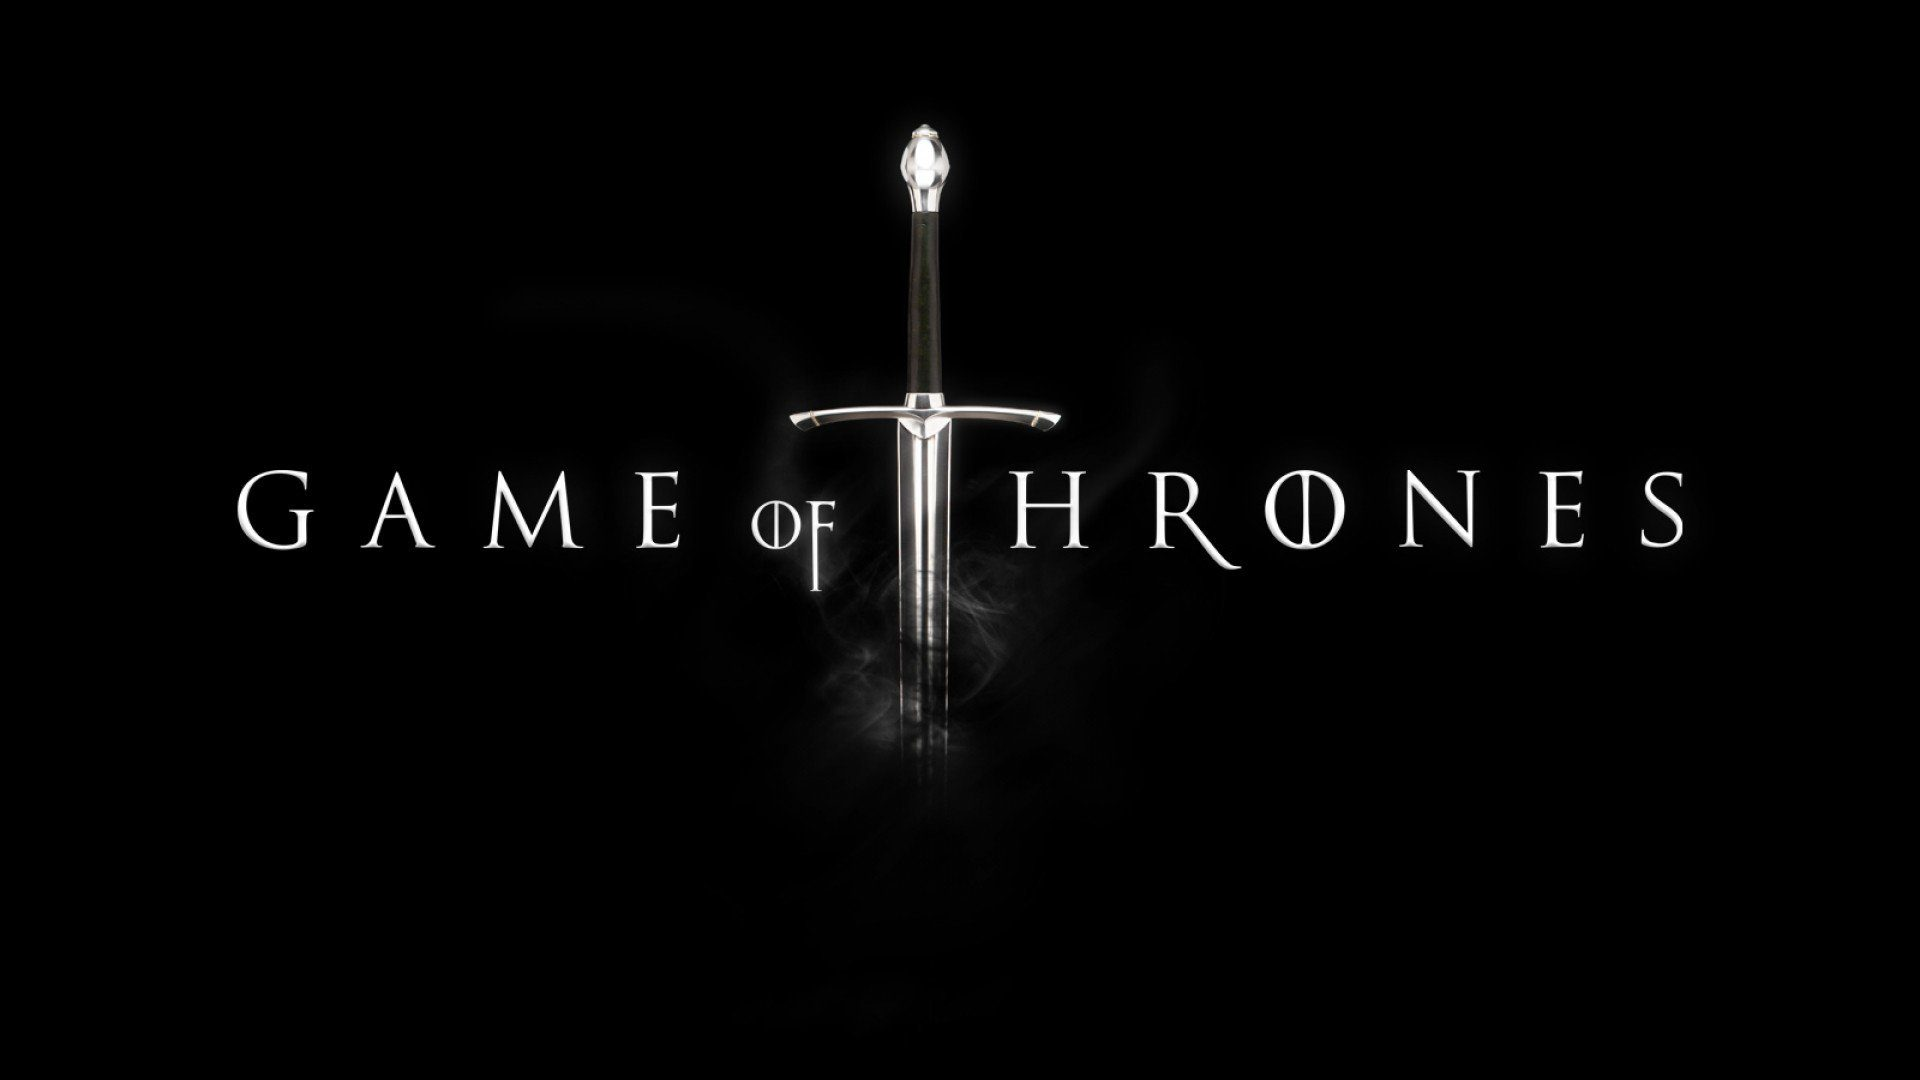 Games of thrones - Pierre-Louis